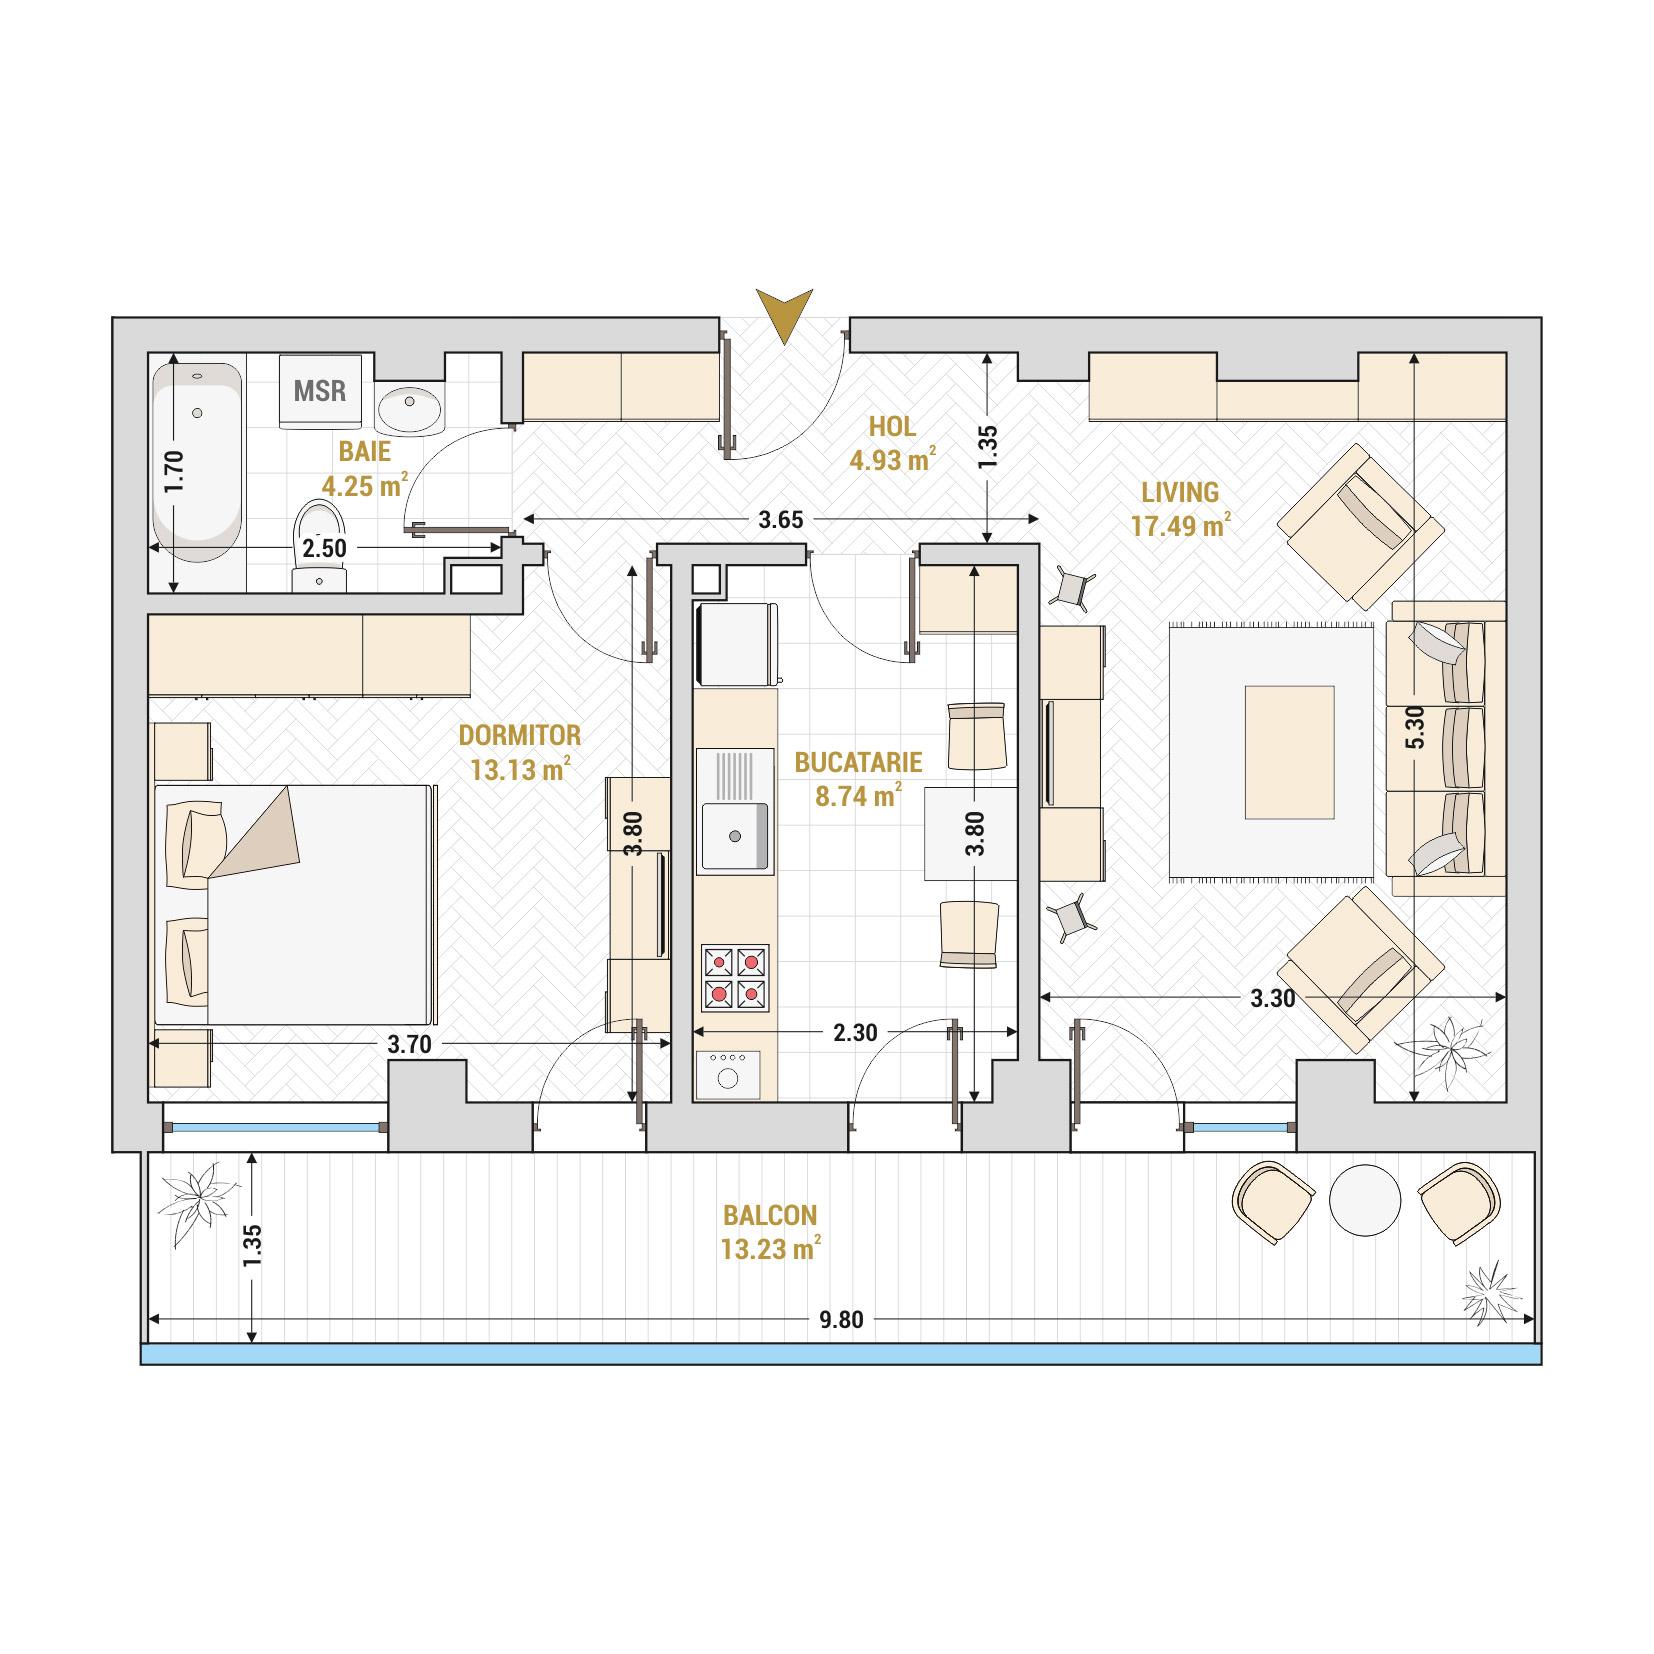 Apartament 2 camere de vanzare Bucuresti - Catedral Residence - Marriott, Piata Unirii, 13 Septembrie, Izvor - Tip 5 - T1